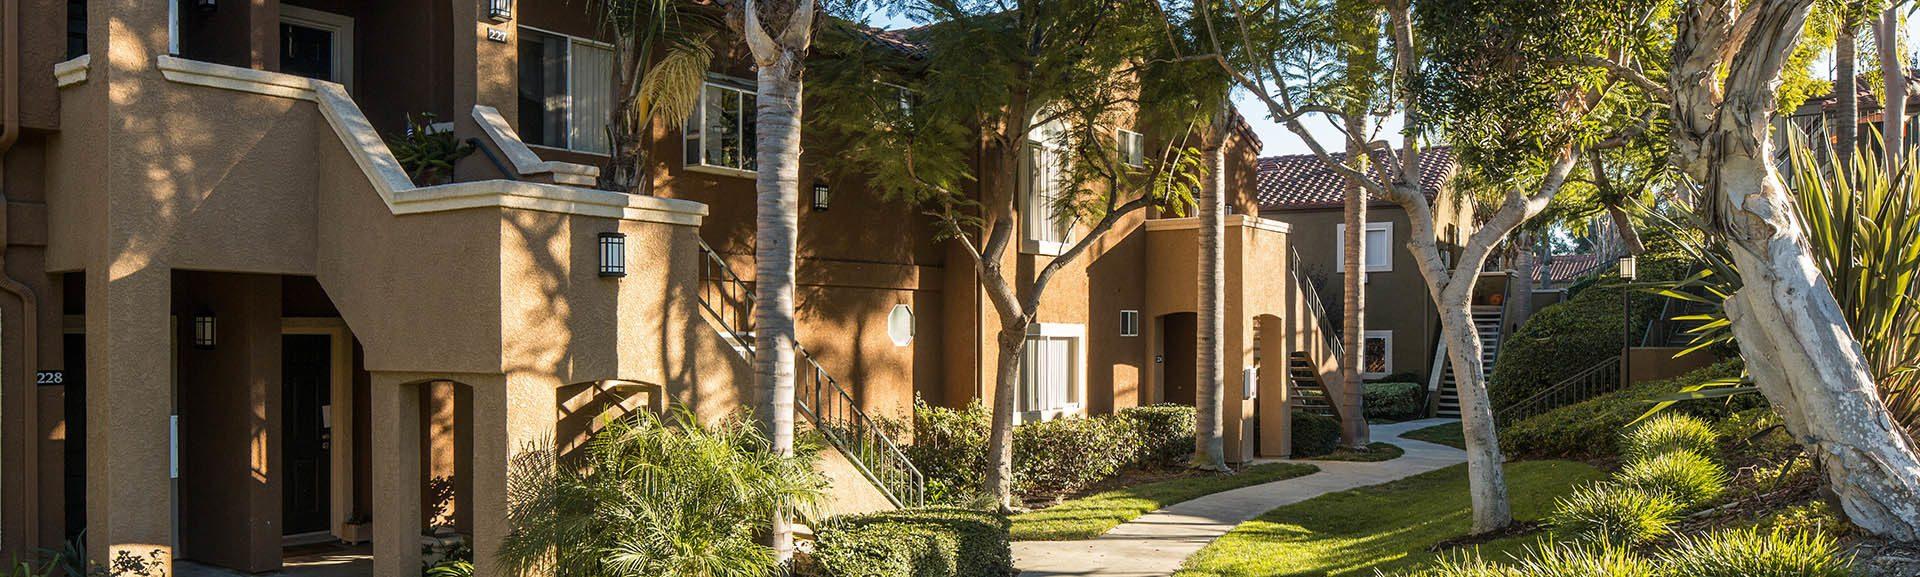 View our floor plans at Niguel Summit Condominium Rentals on our website